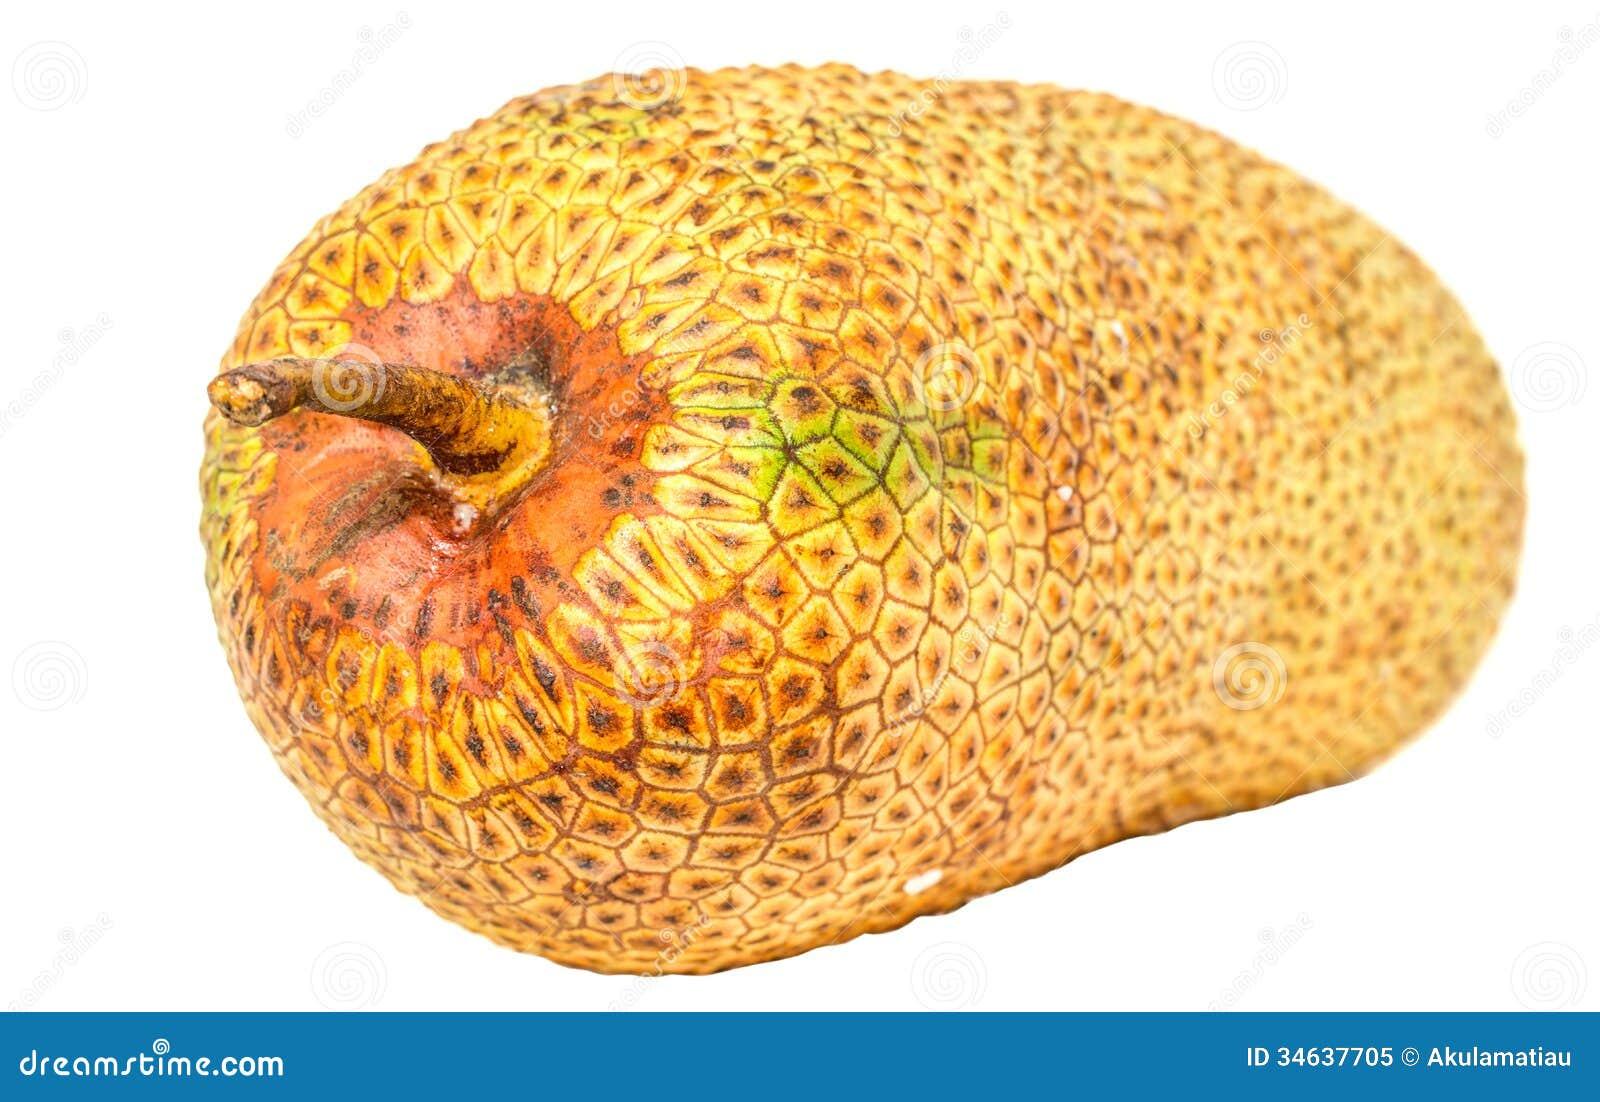 Cempedak Fruit V stock image. Image of skin, asia, fibrous - 34637705